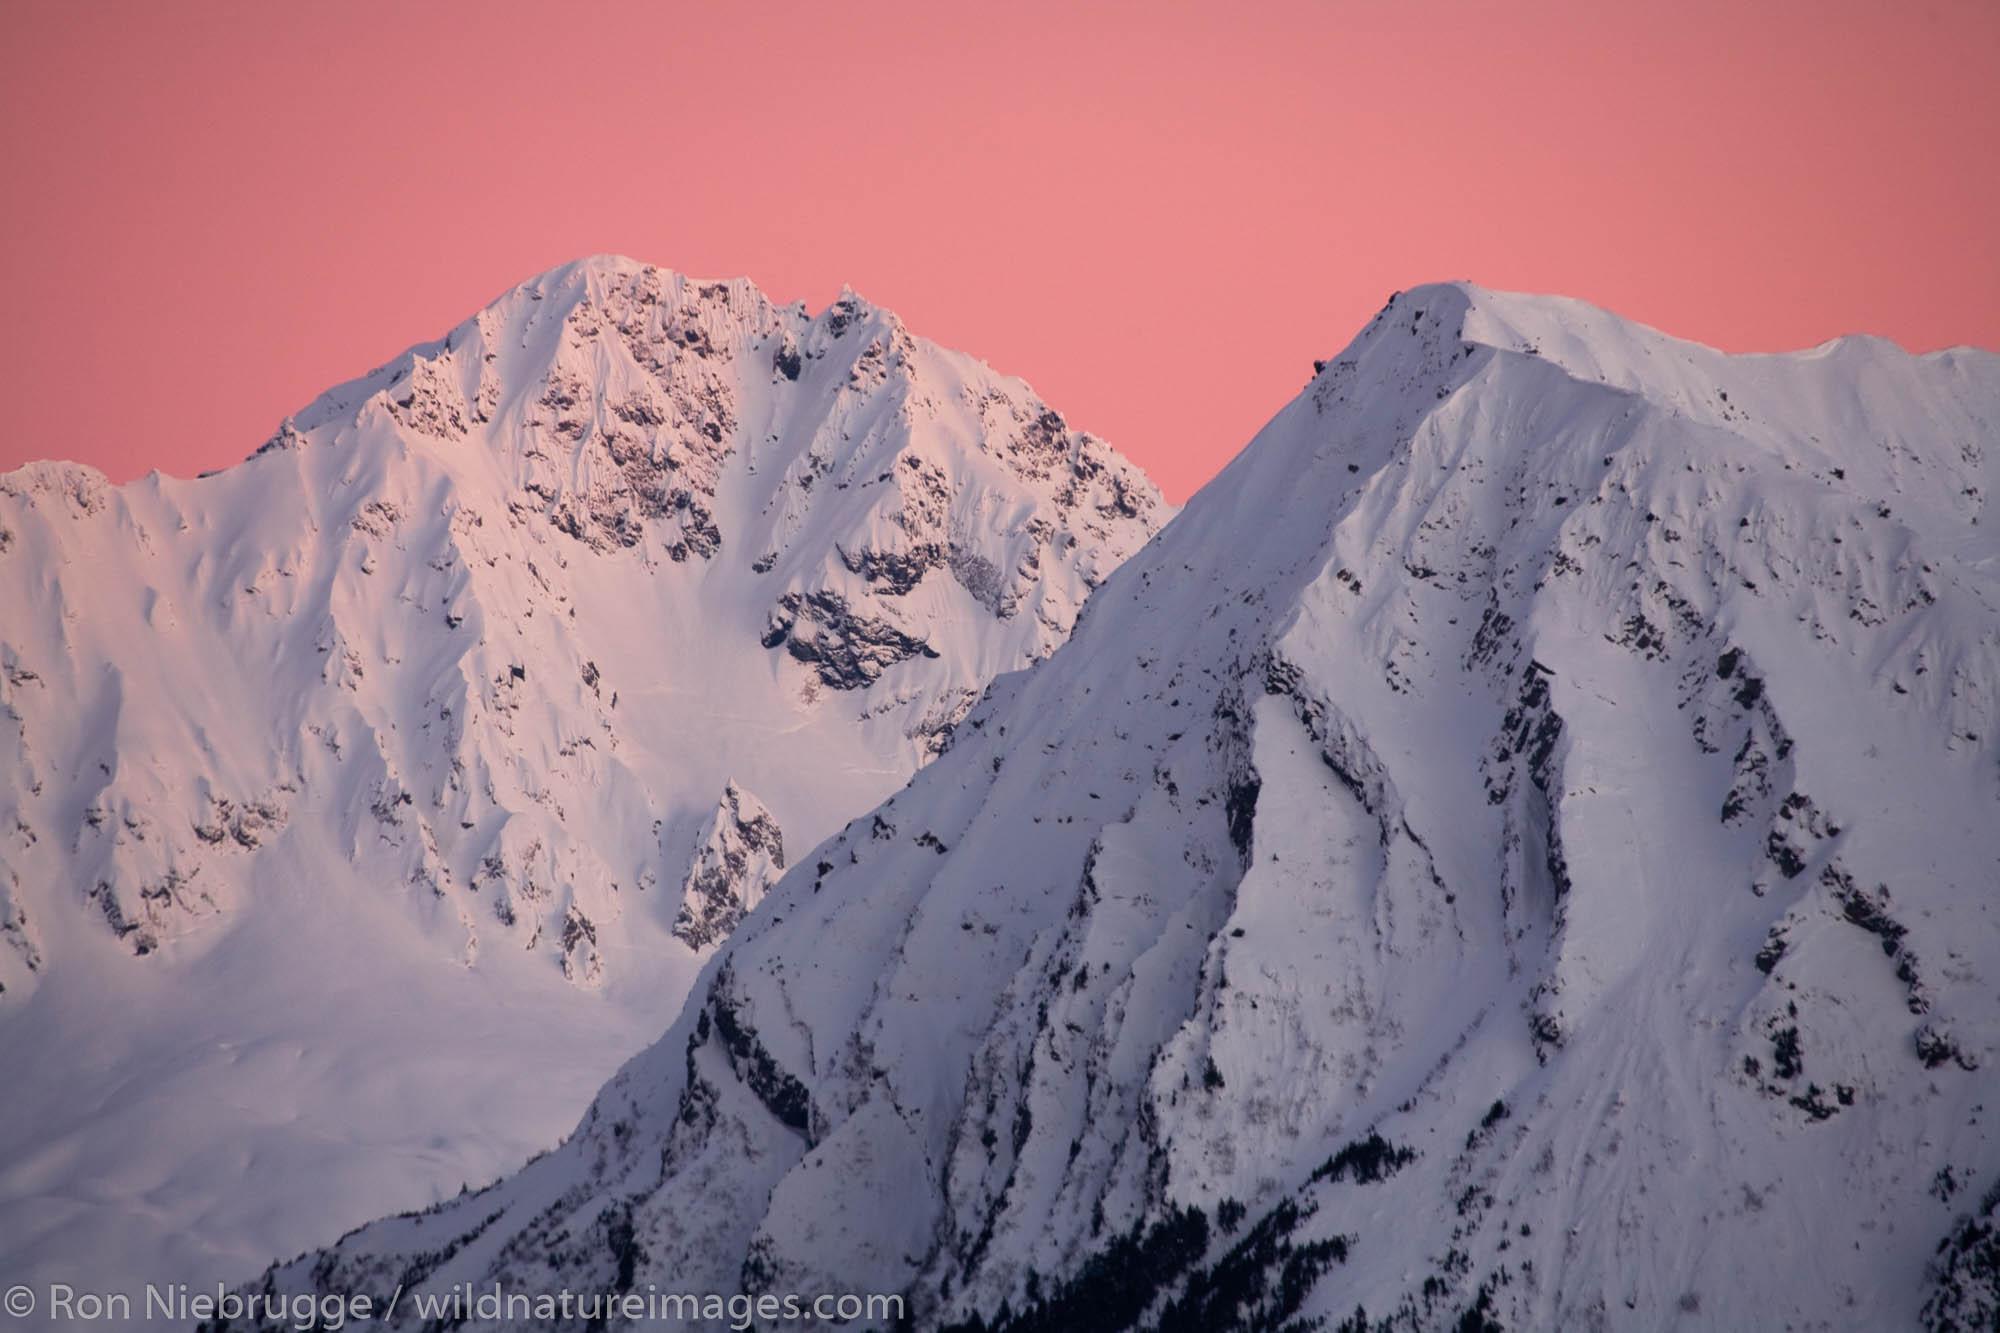 Alpenglow on the mountains of the Resurrection Peninsula, Seward, Alaska.